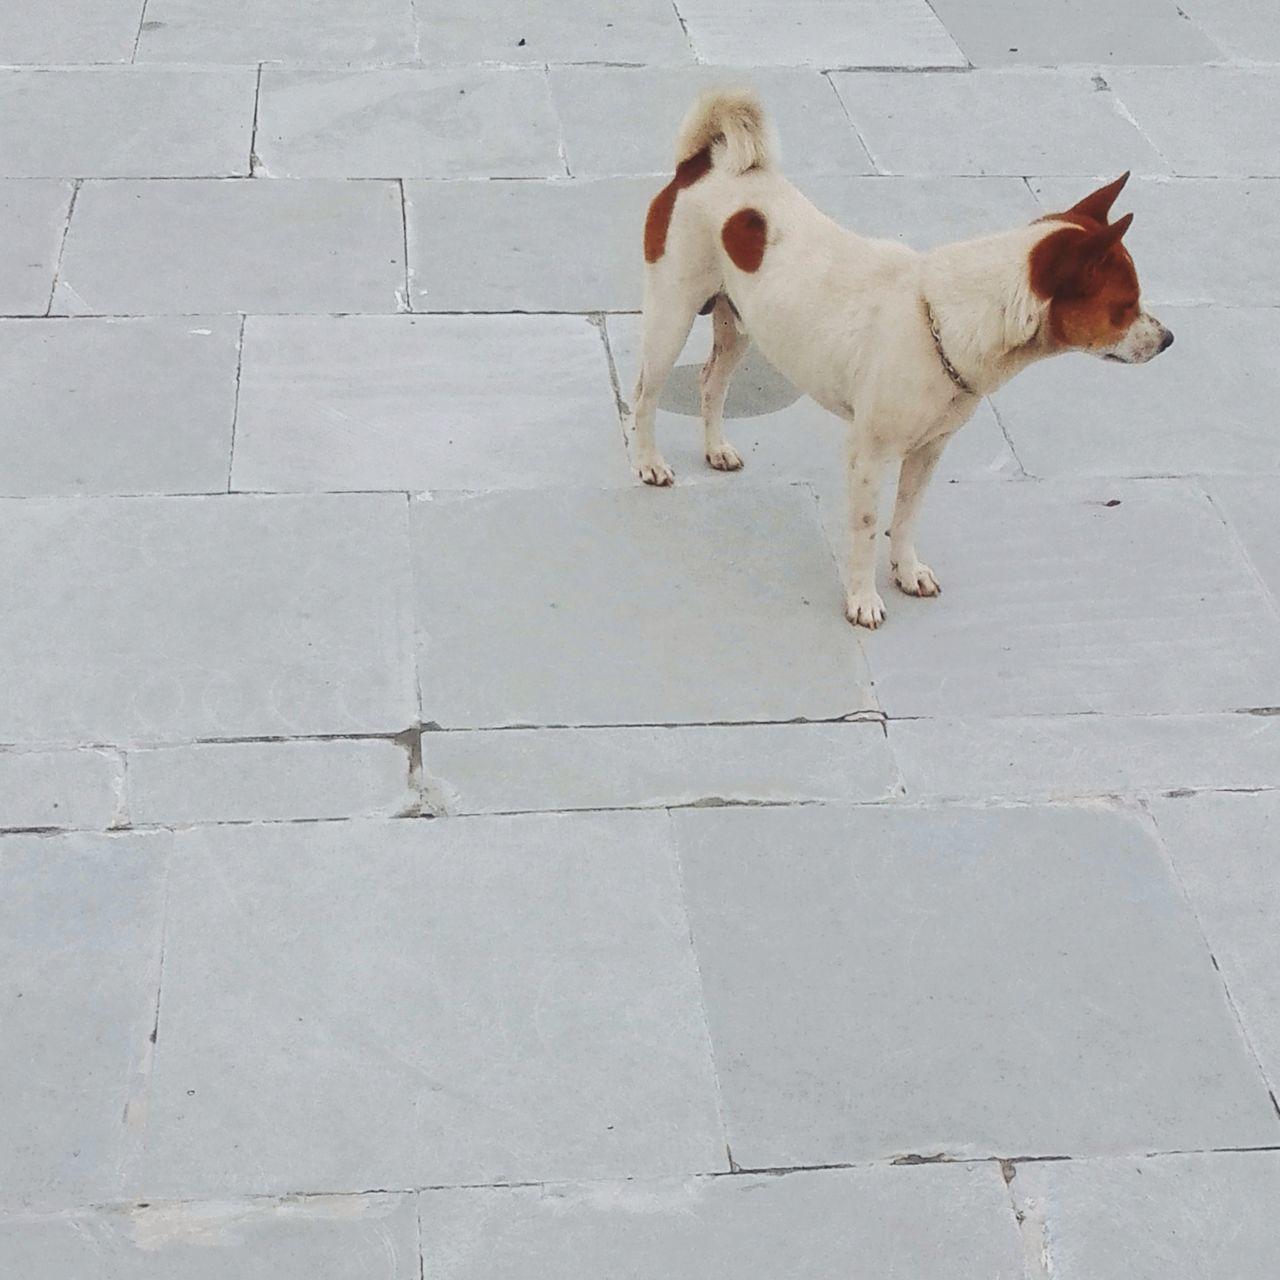 Say hello to him Dog EyeEmBestPics EyeEm Best Shots Animals Enjoying Life Bestoftheday India EyeEm Nature Lover EyeEm Gallery Hello World Check This Out Wanderlust